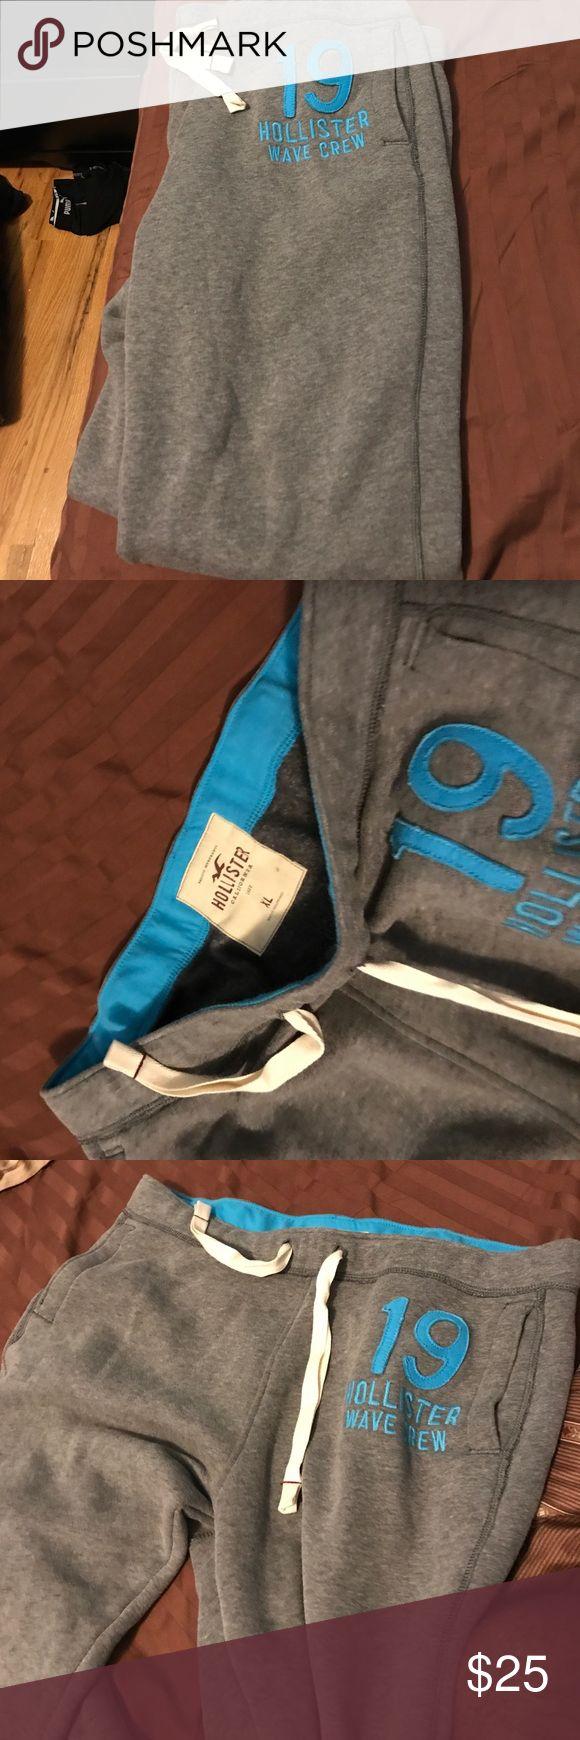 Hollister sweatpants New classic hollister sweatpants size XL Pants Sweatpants & Joggers